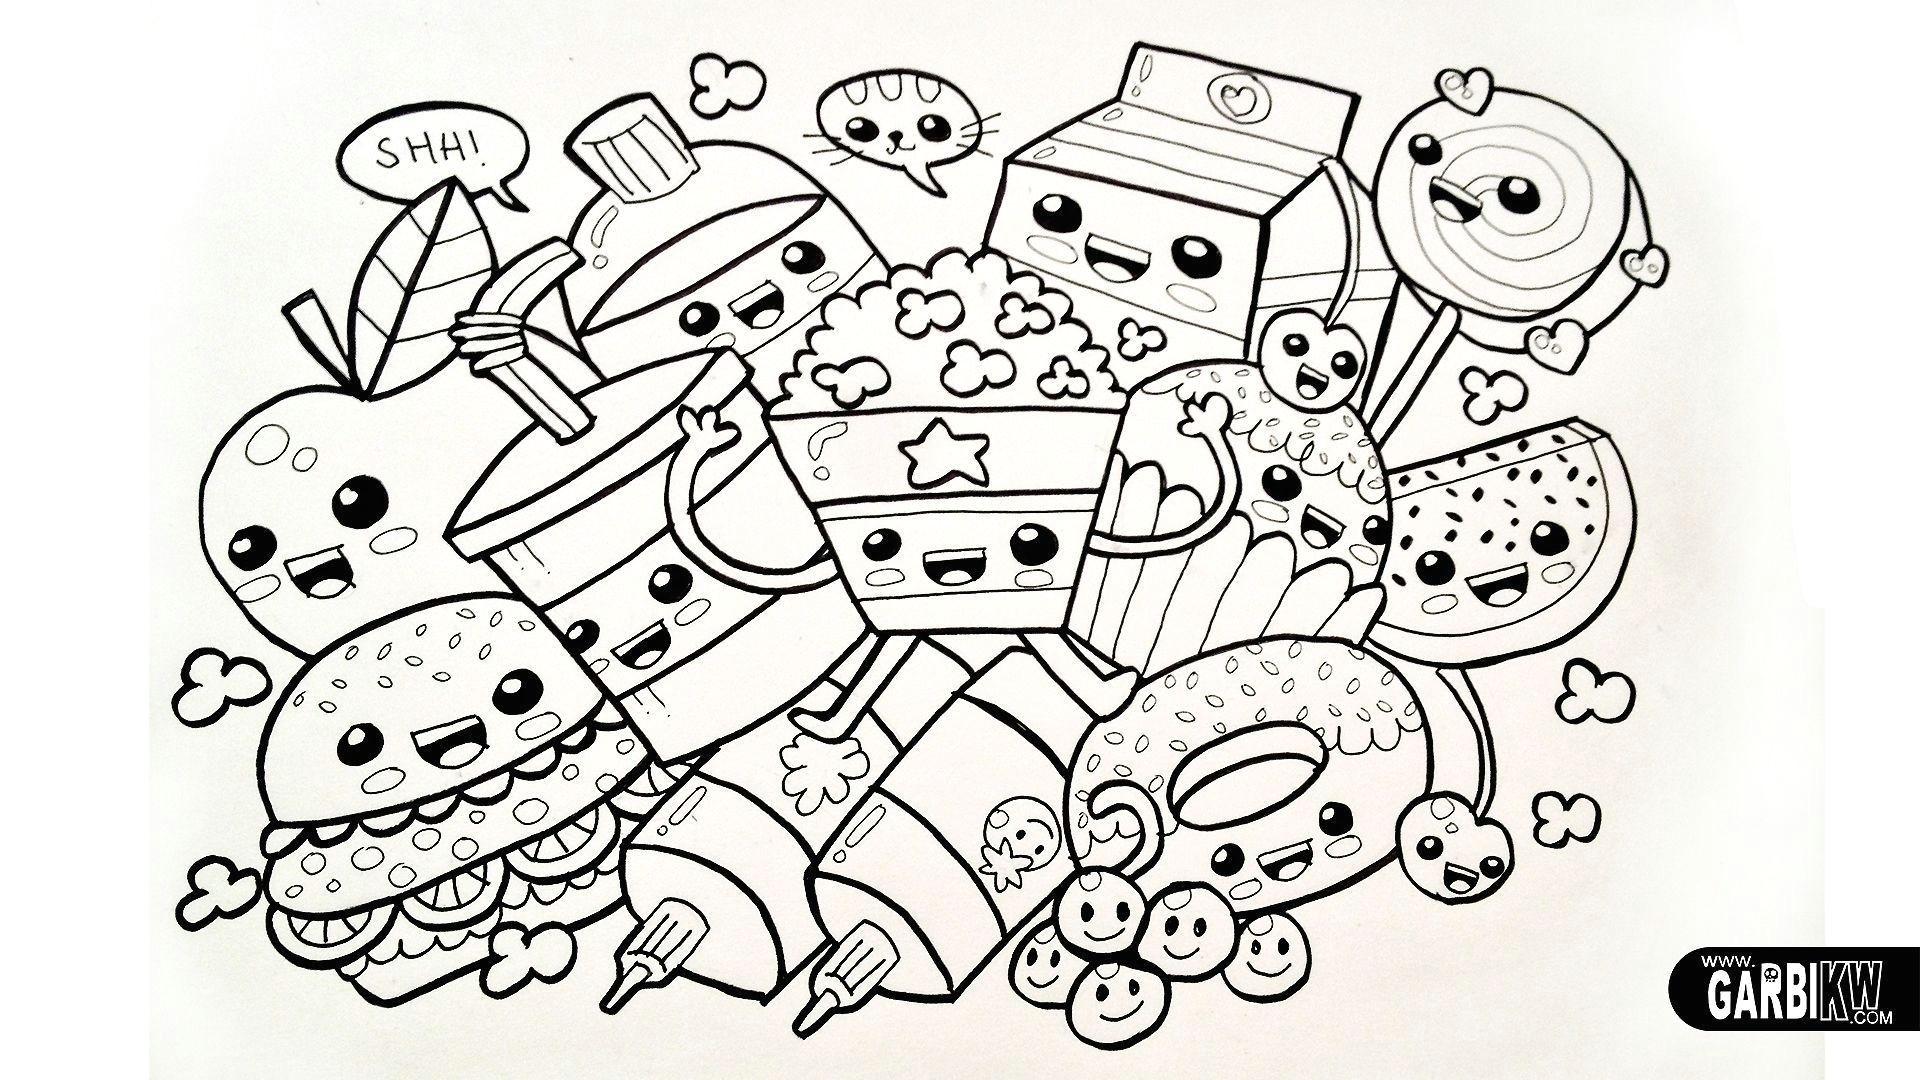 3205e140f3c69de25d929df1c827b8ab kawaii coloring pages free best of unique cute kawaii animal 1920 1080 jpeg